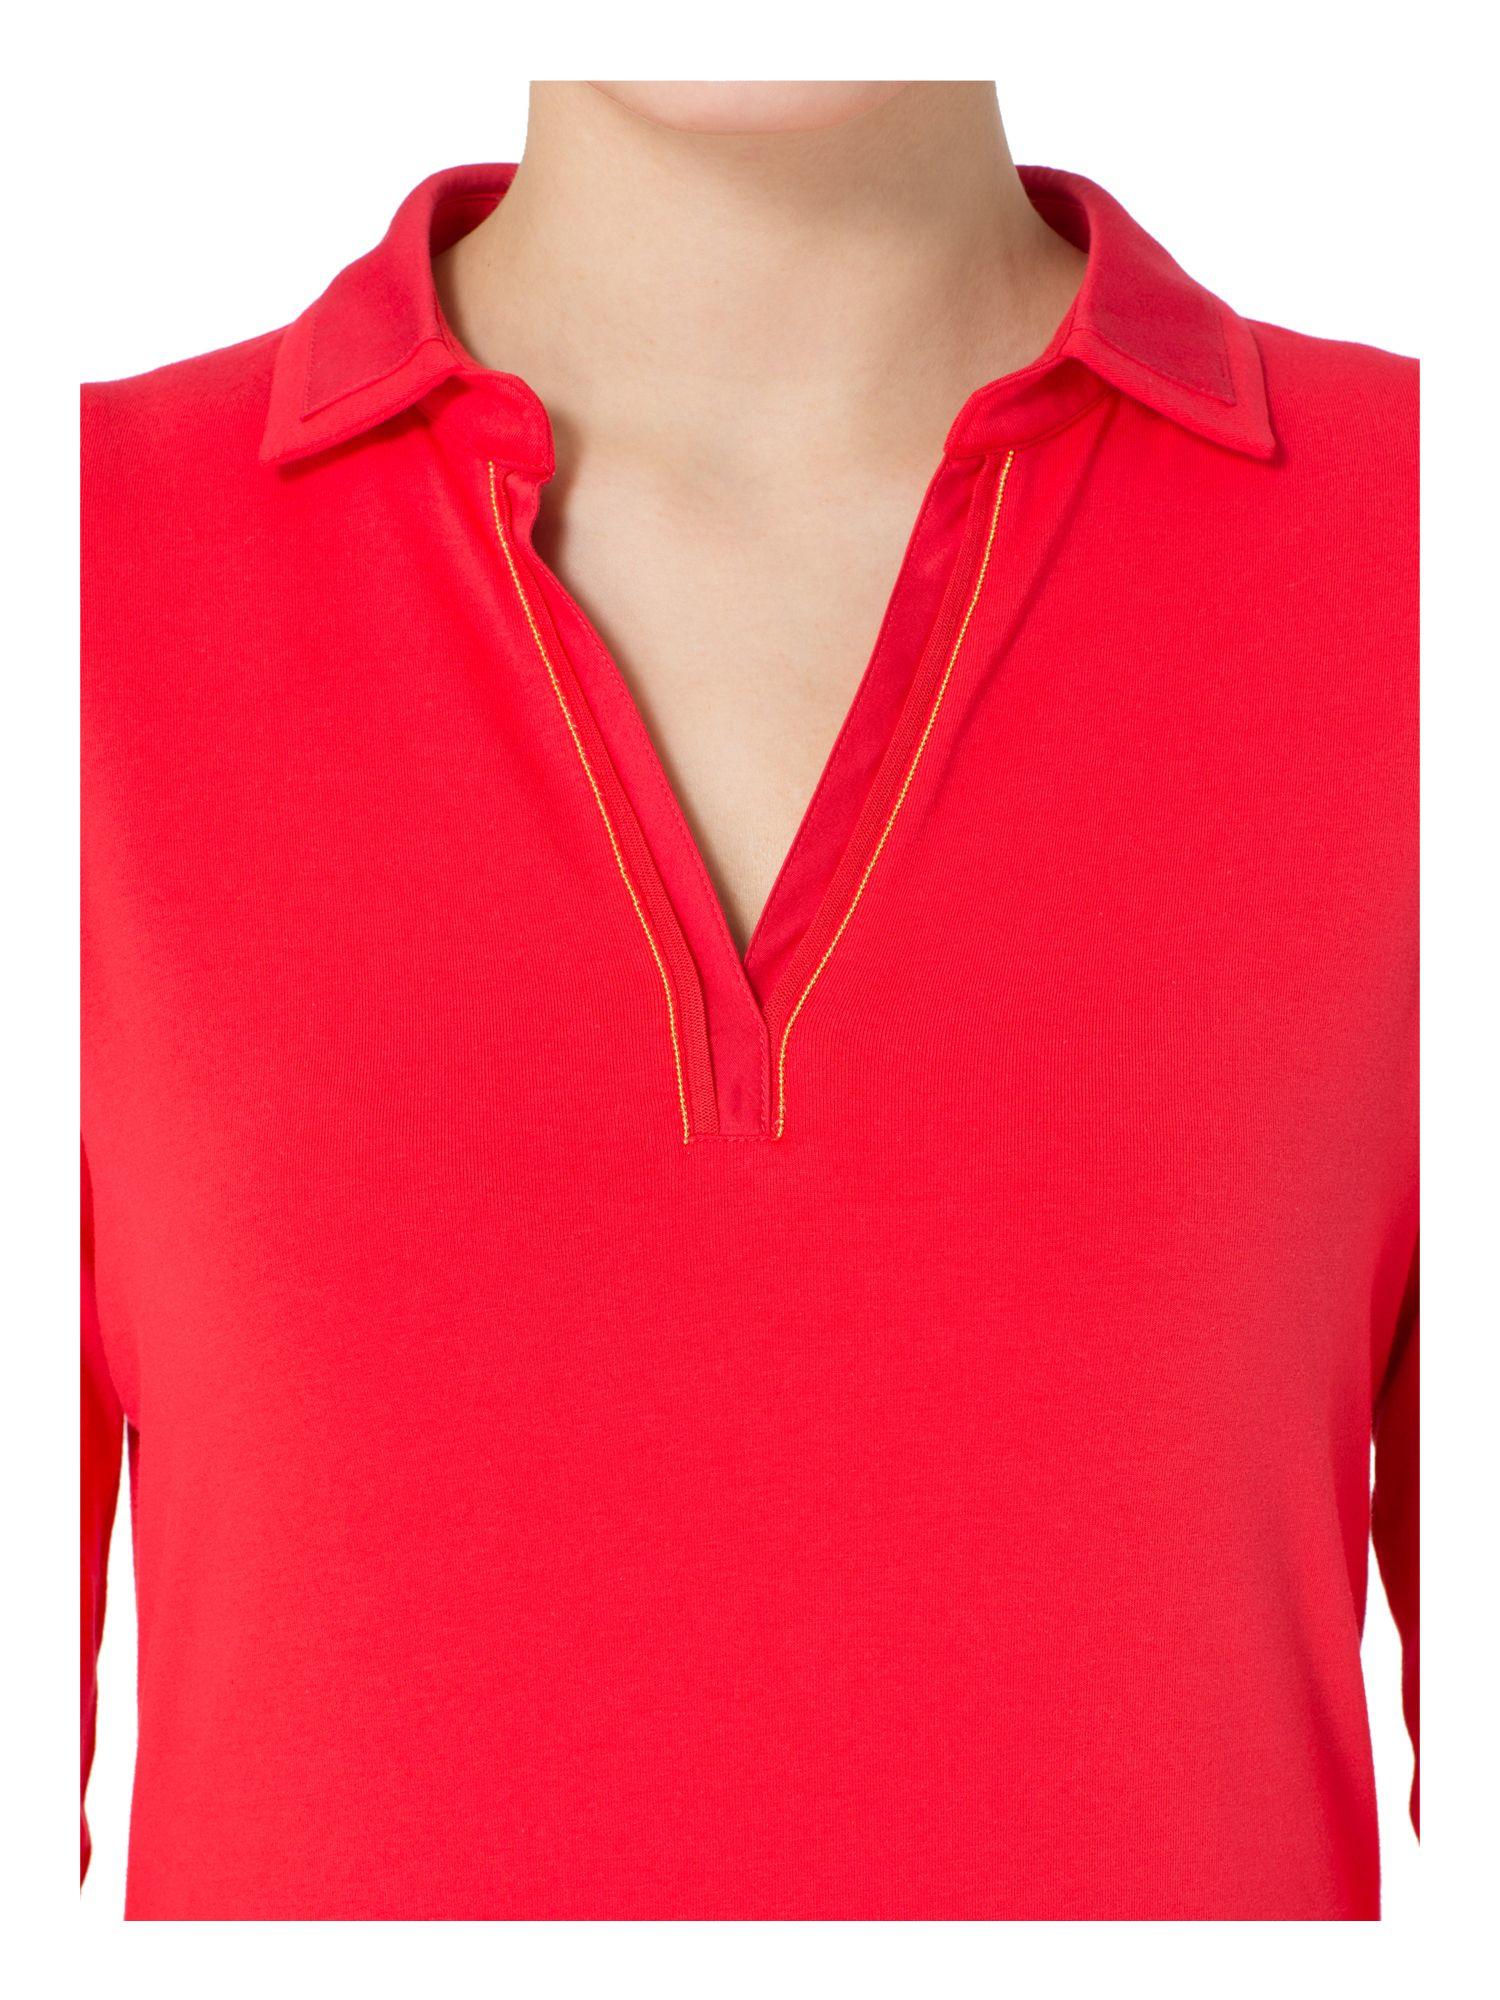 basler polo shirt with v neck detail in red lyst. Black Bedroom Furniture Sets. Home Design Ideas